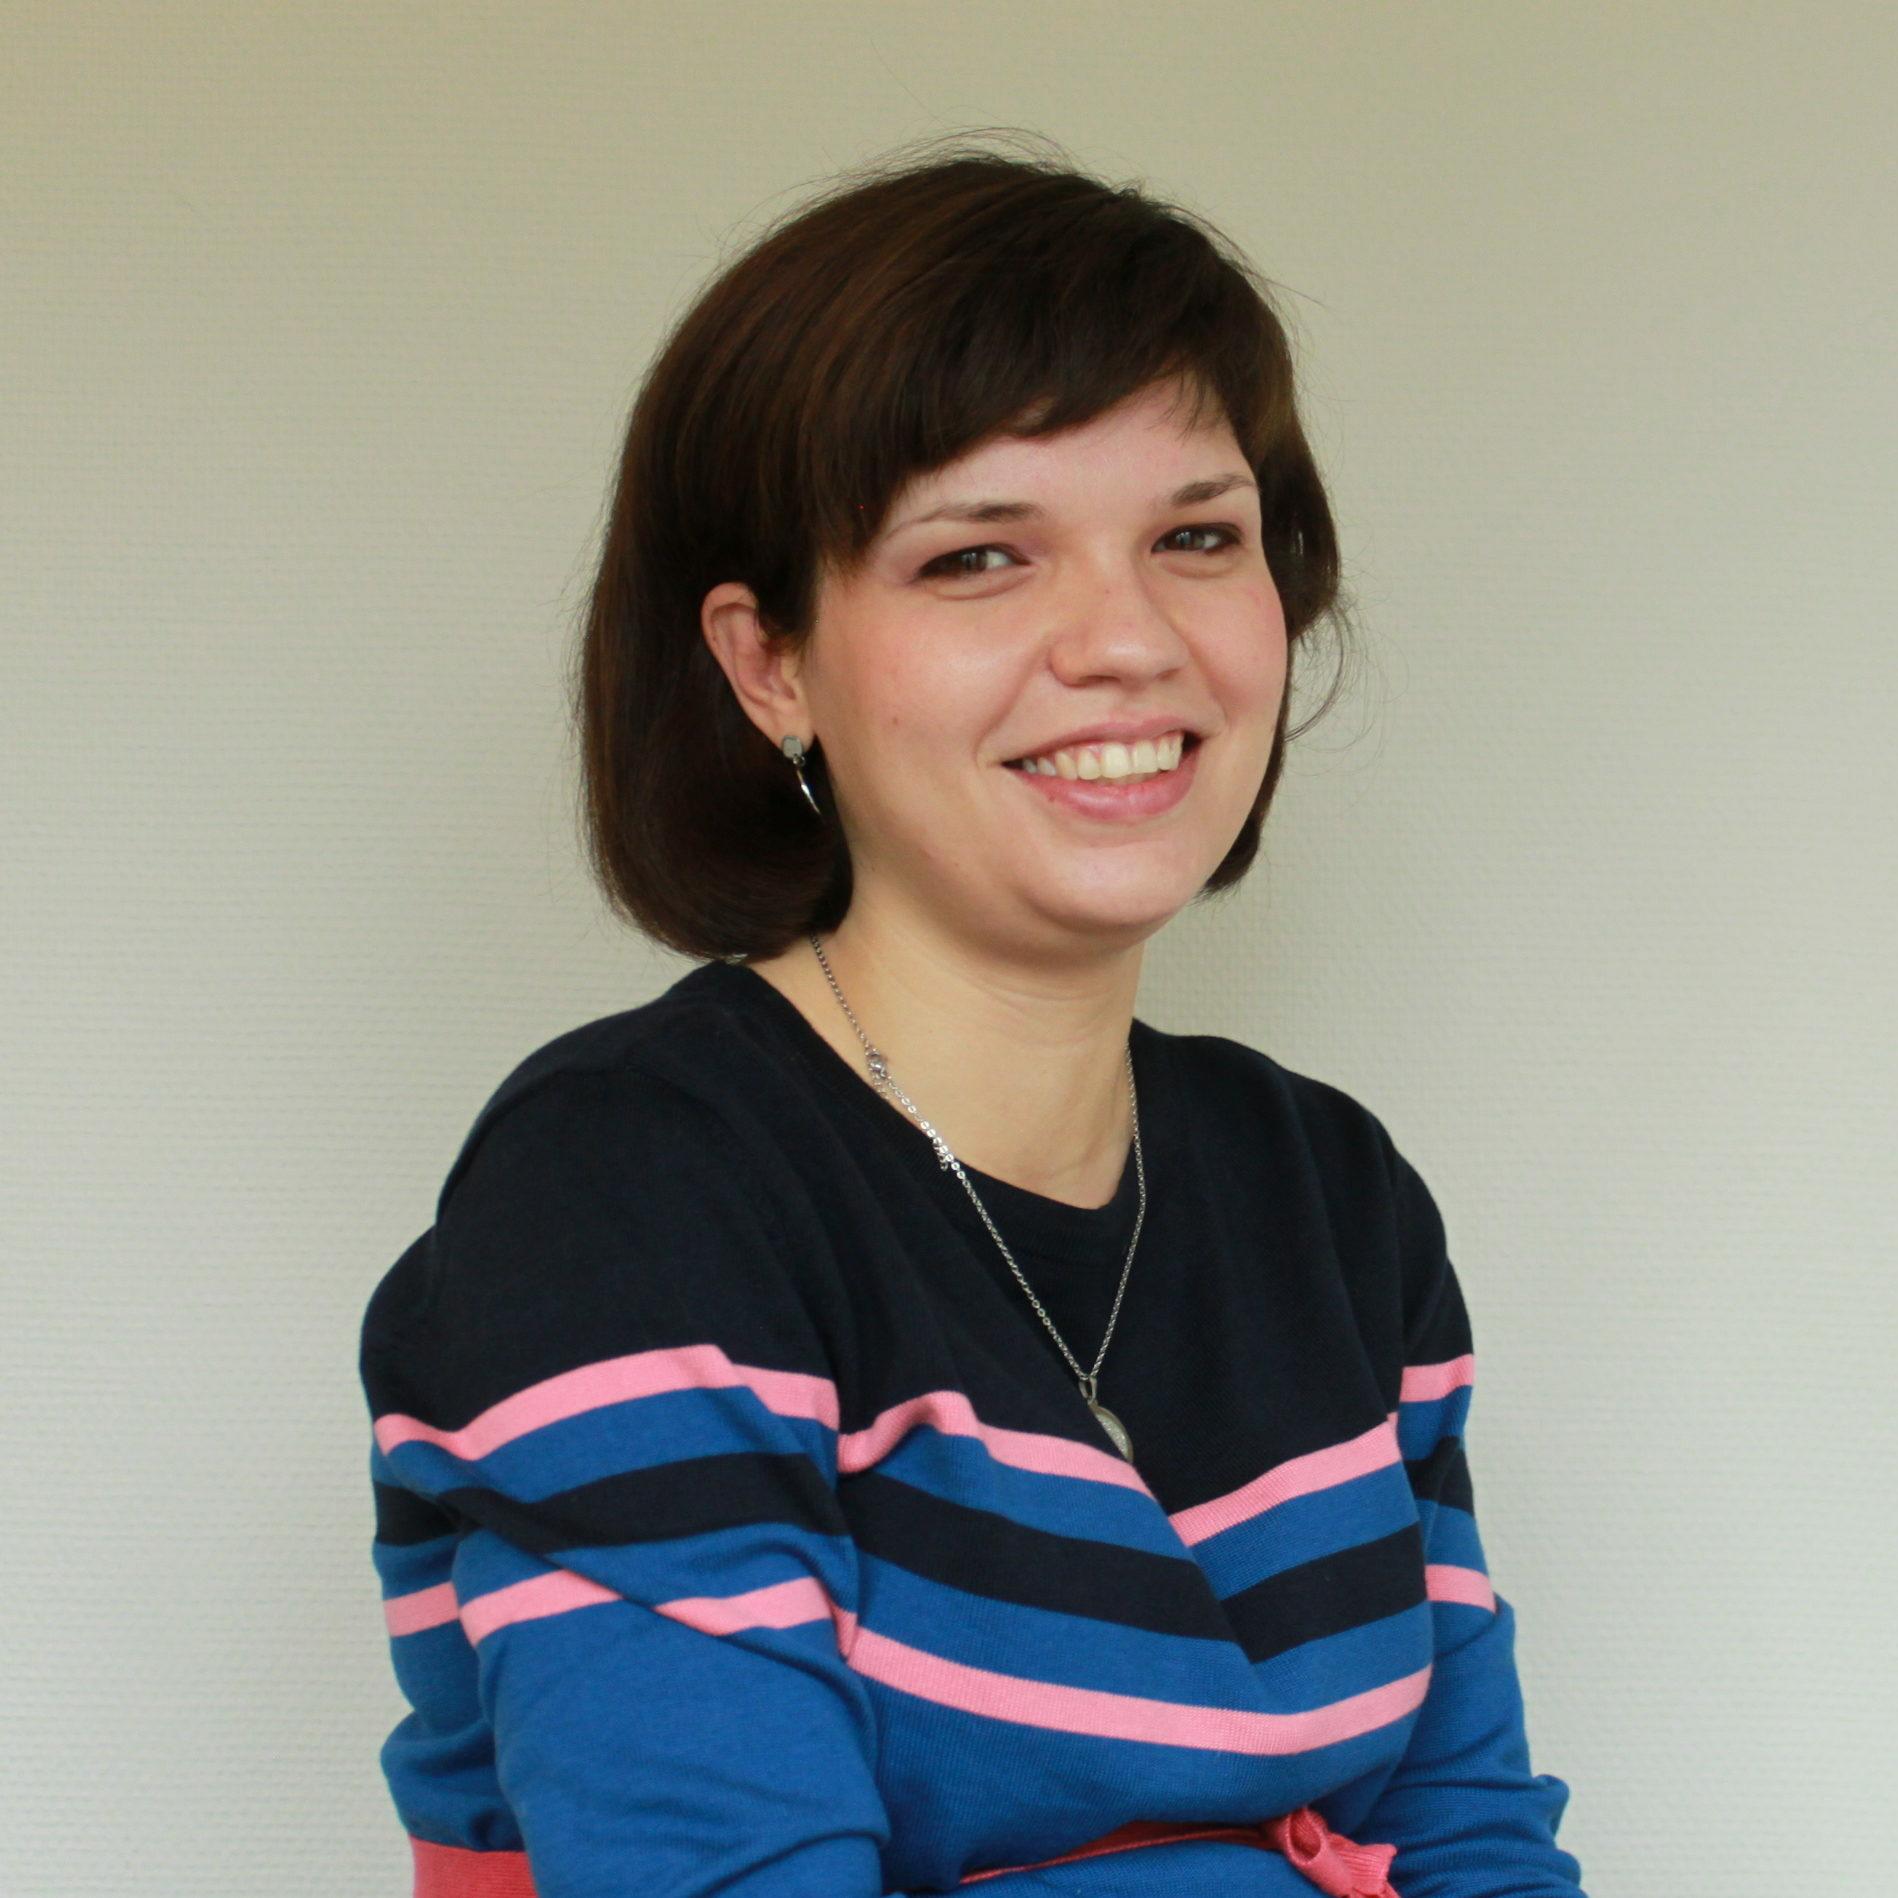 Psycholoog Clara Witdouck stress depressie mindfulness